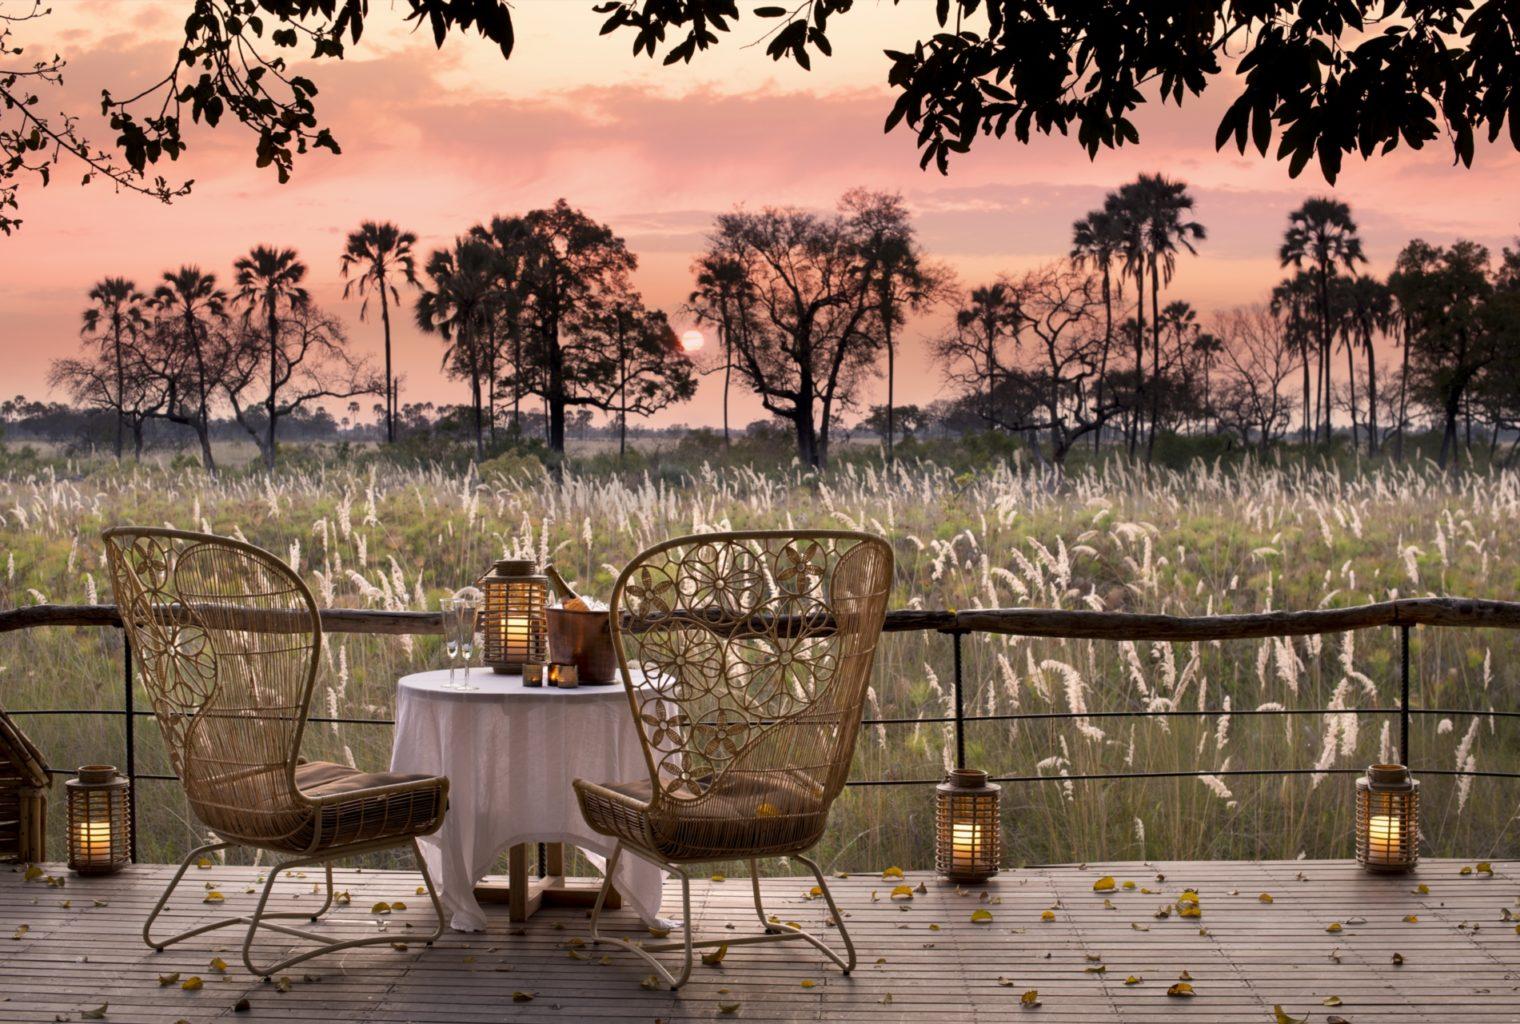 Deck view, Sandibe, Okavango Delta, Botswana Sunset